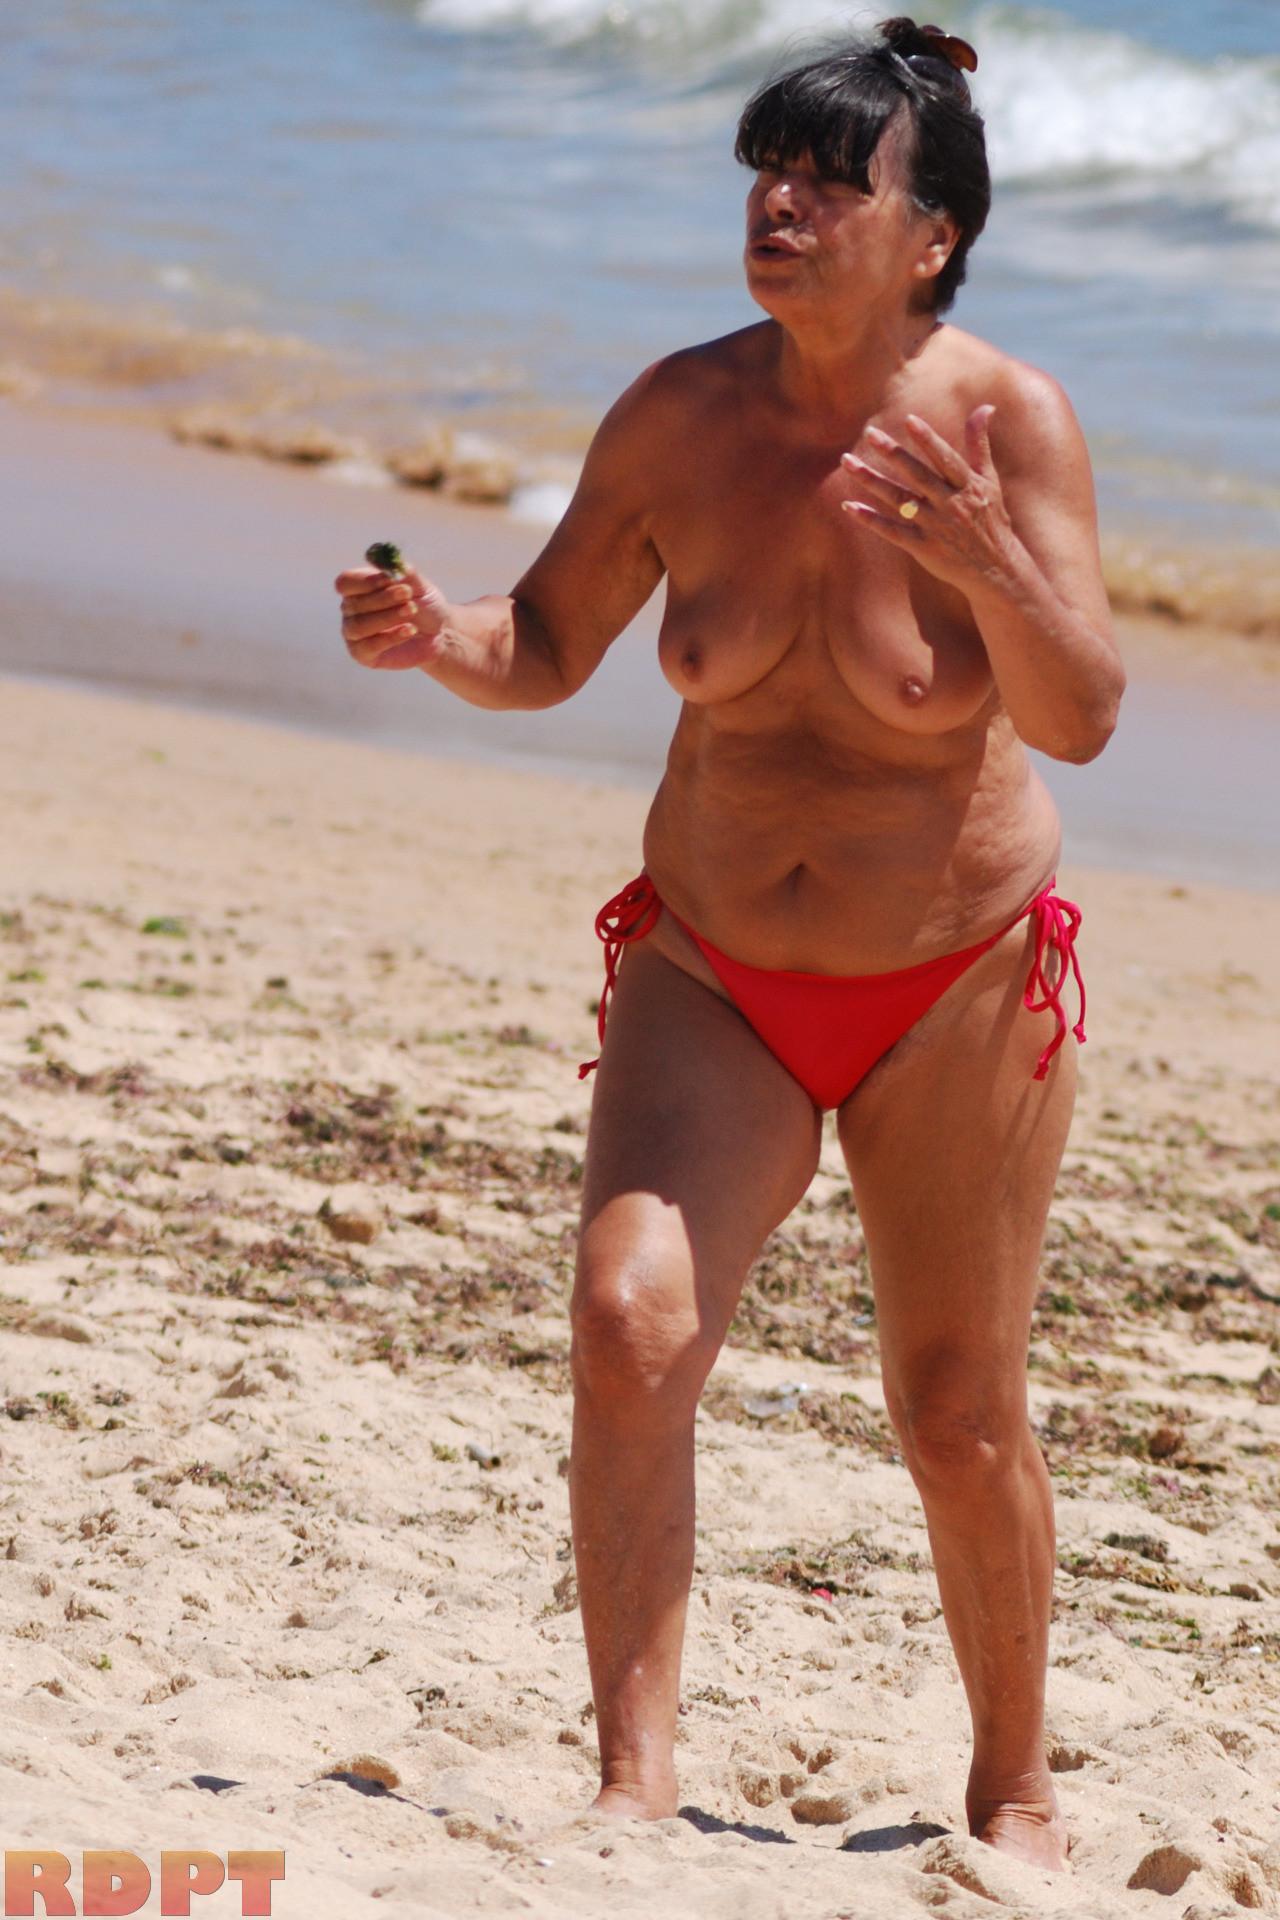 Naked milfs beach nudist couples voyeur hd video spycam 7